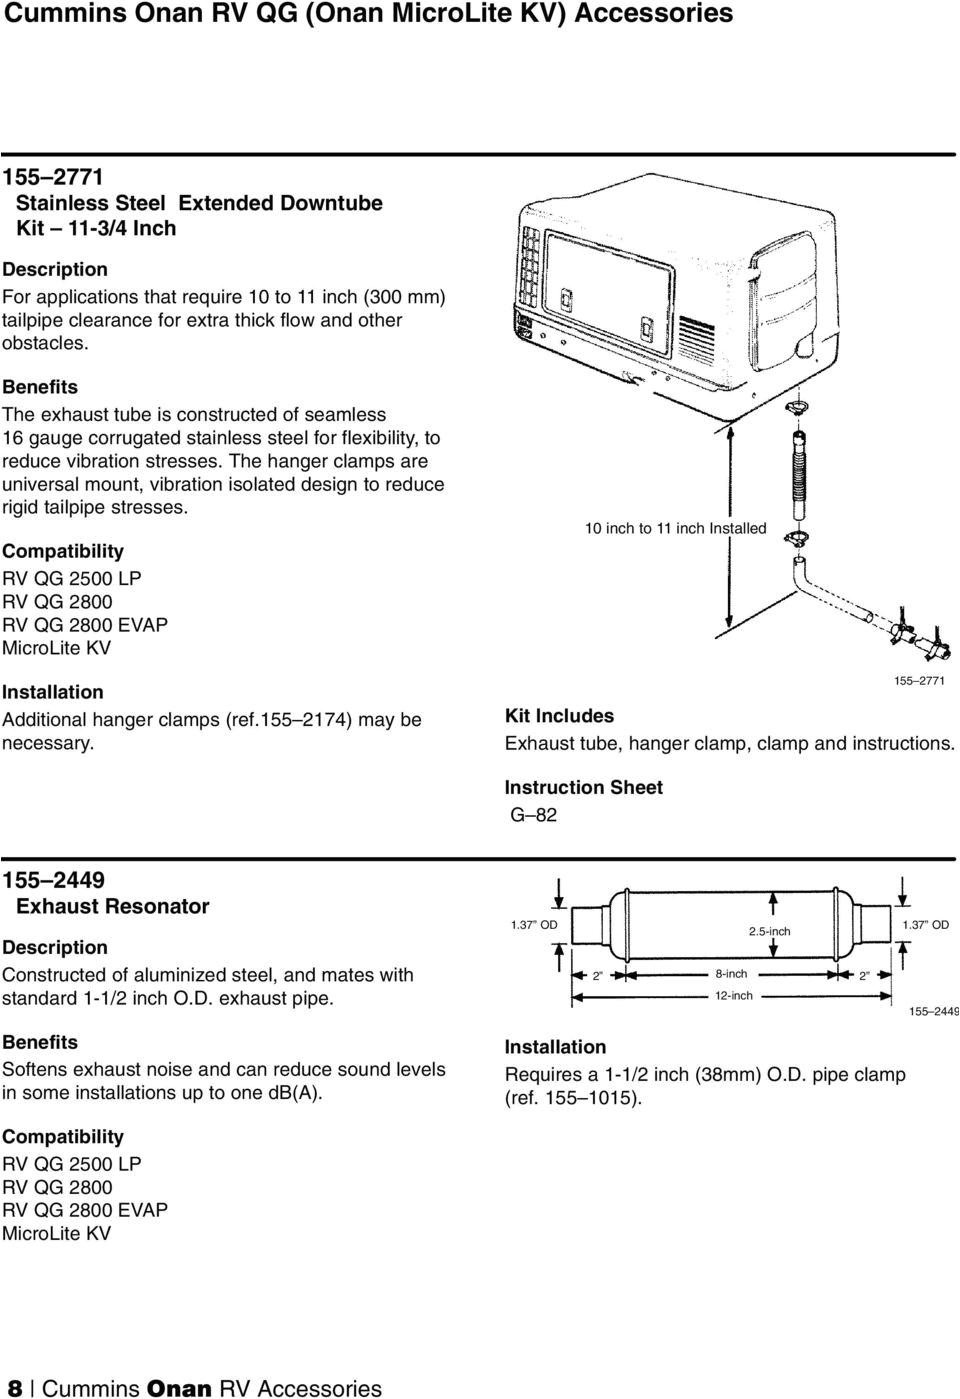 Intelilite Amf 25 Wiring Diagram Intelilite Amf 25 Wiring Diagram Awesome Manual 5212 New Idea